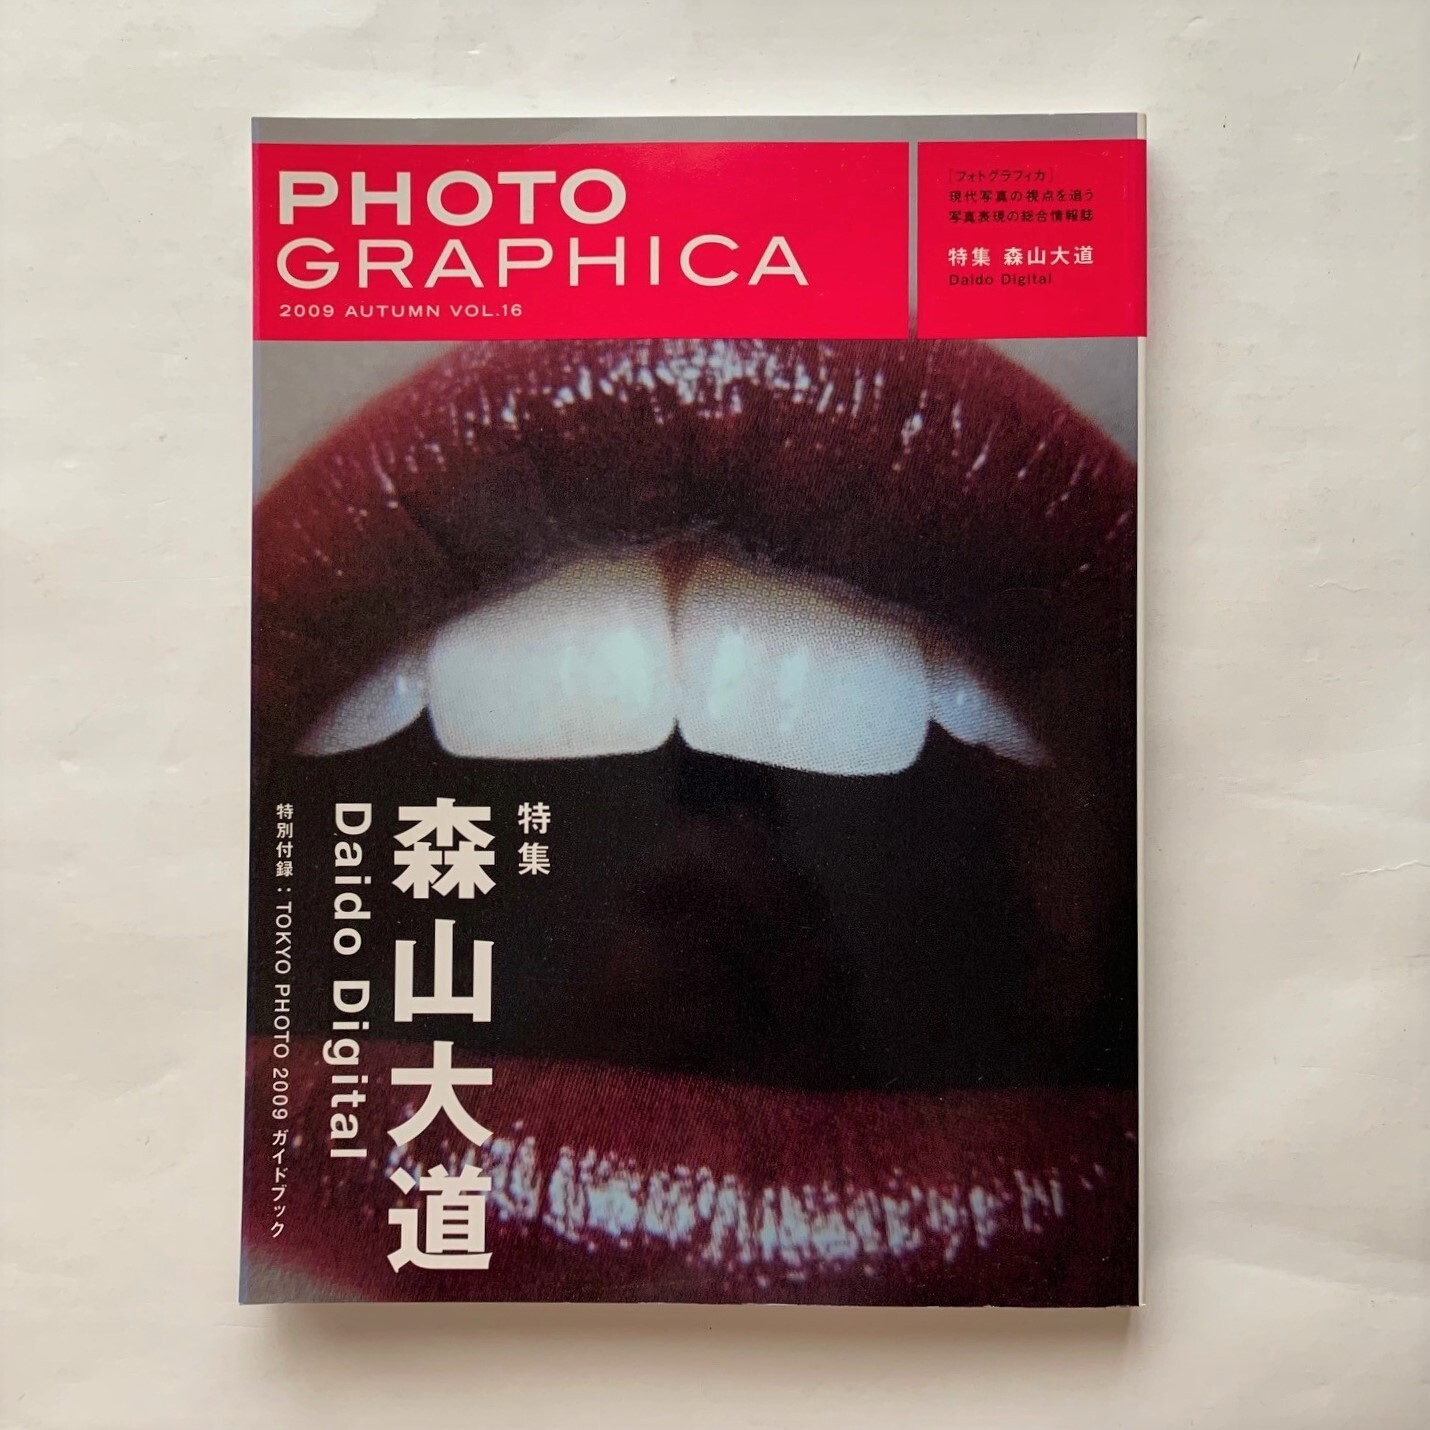 Photo Graphica 2009 Autumn Vol.16  /  森山大道 特集